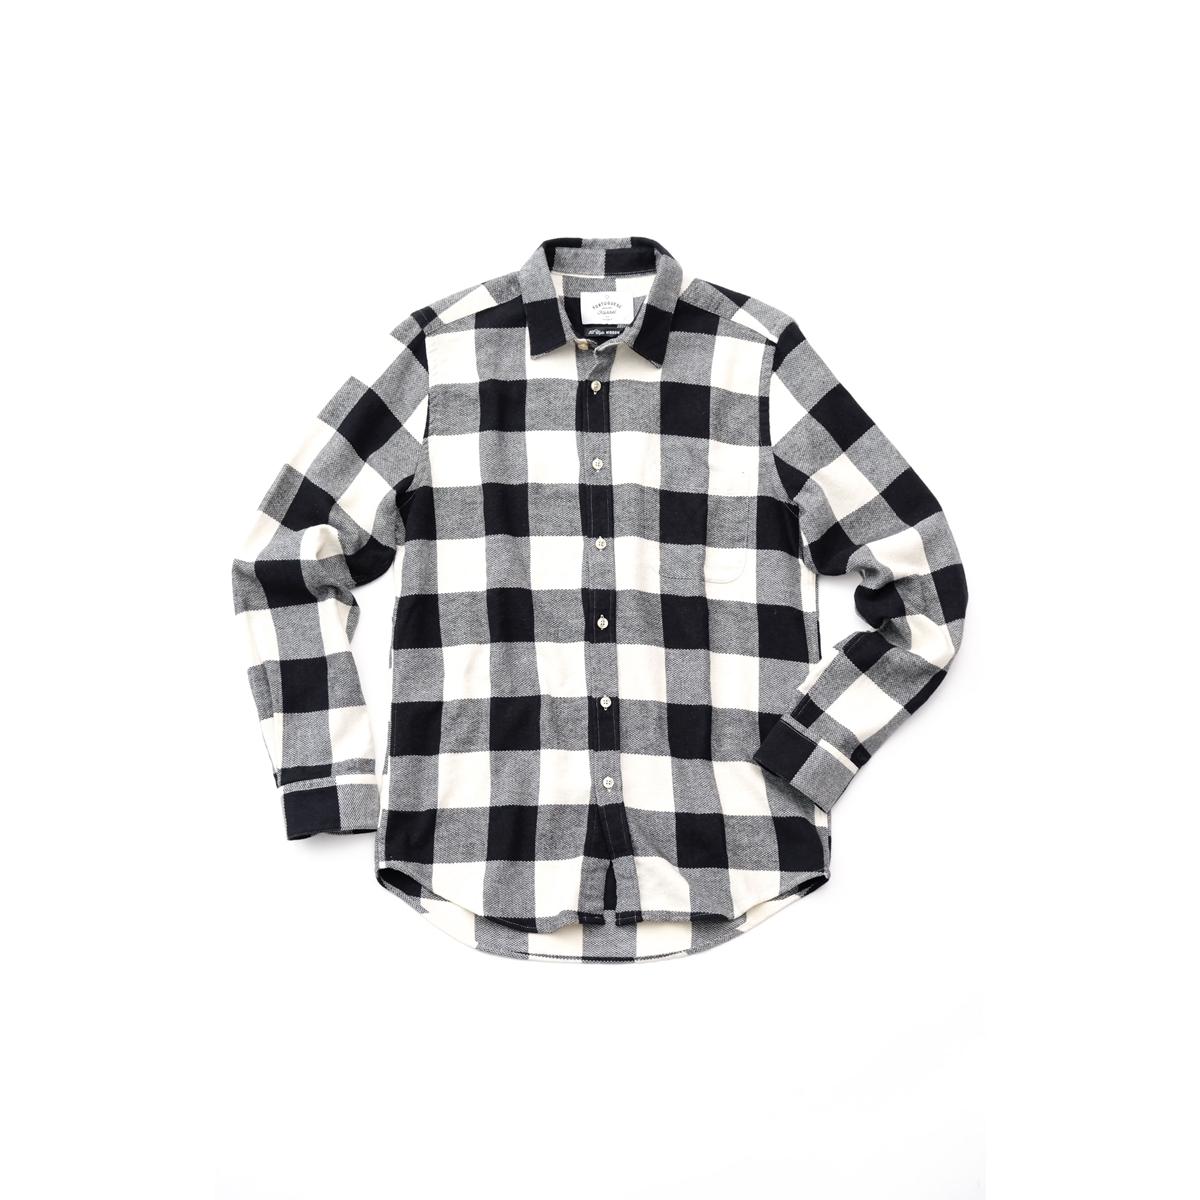 PORTUGUESE Flannel フランネルシャツ ブラック チェック (Black) 700056640 ポルトガル フランネル ネルシャツ シャツ ポルトガルコットン メンズ 送料無料